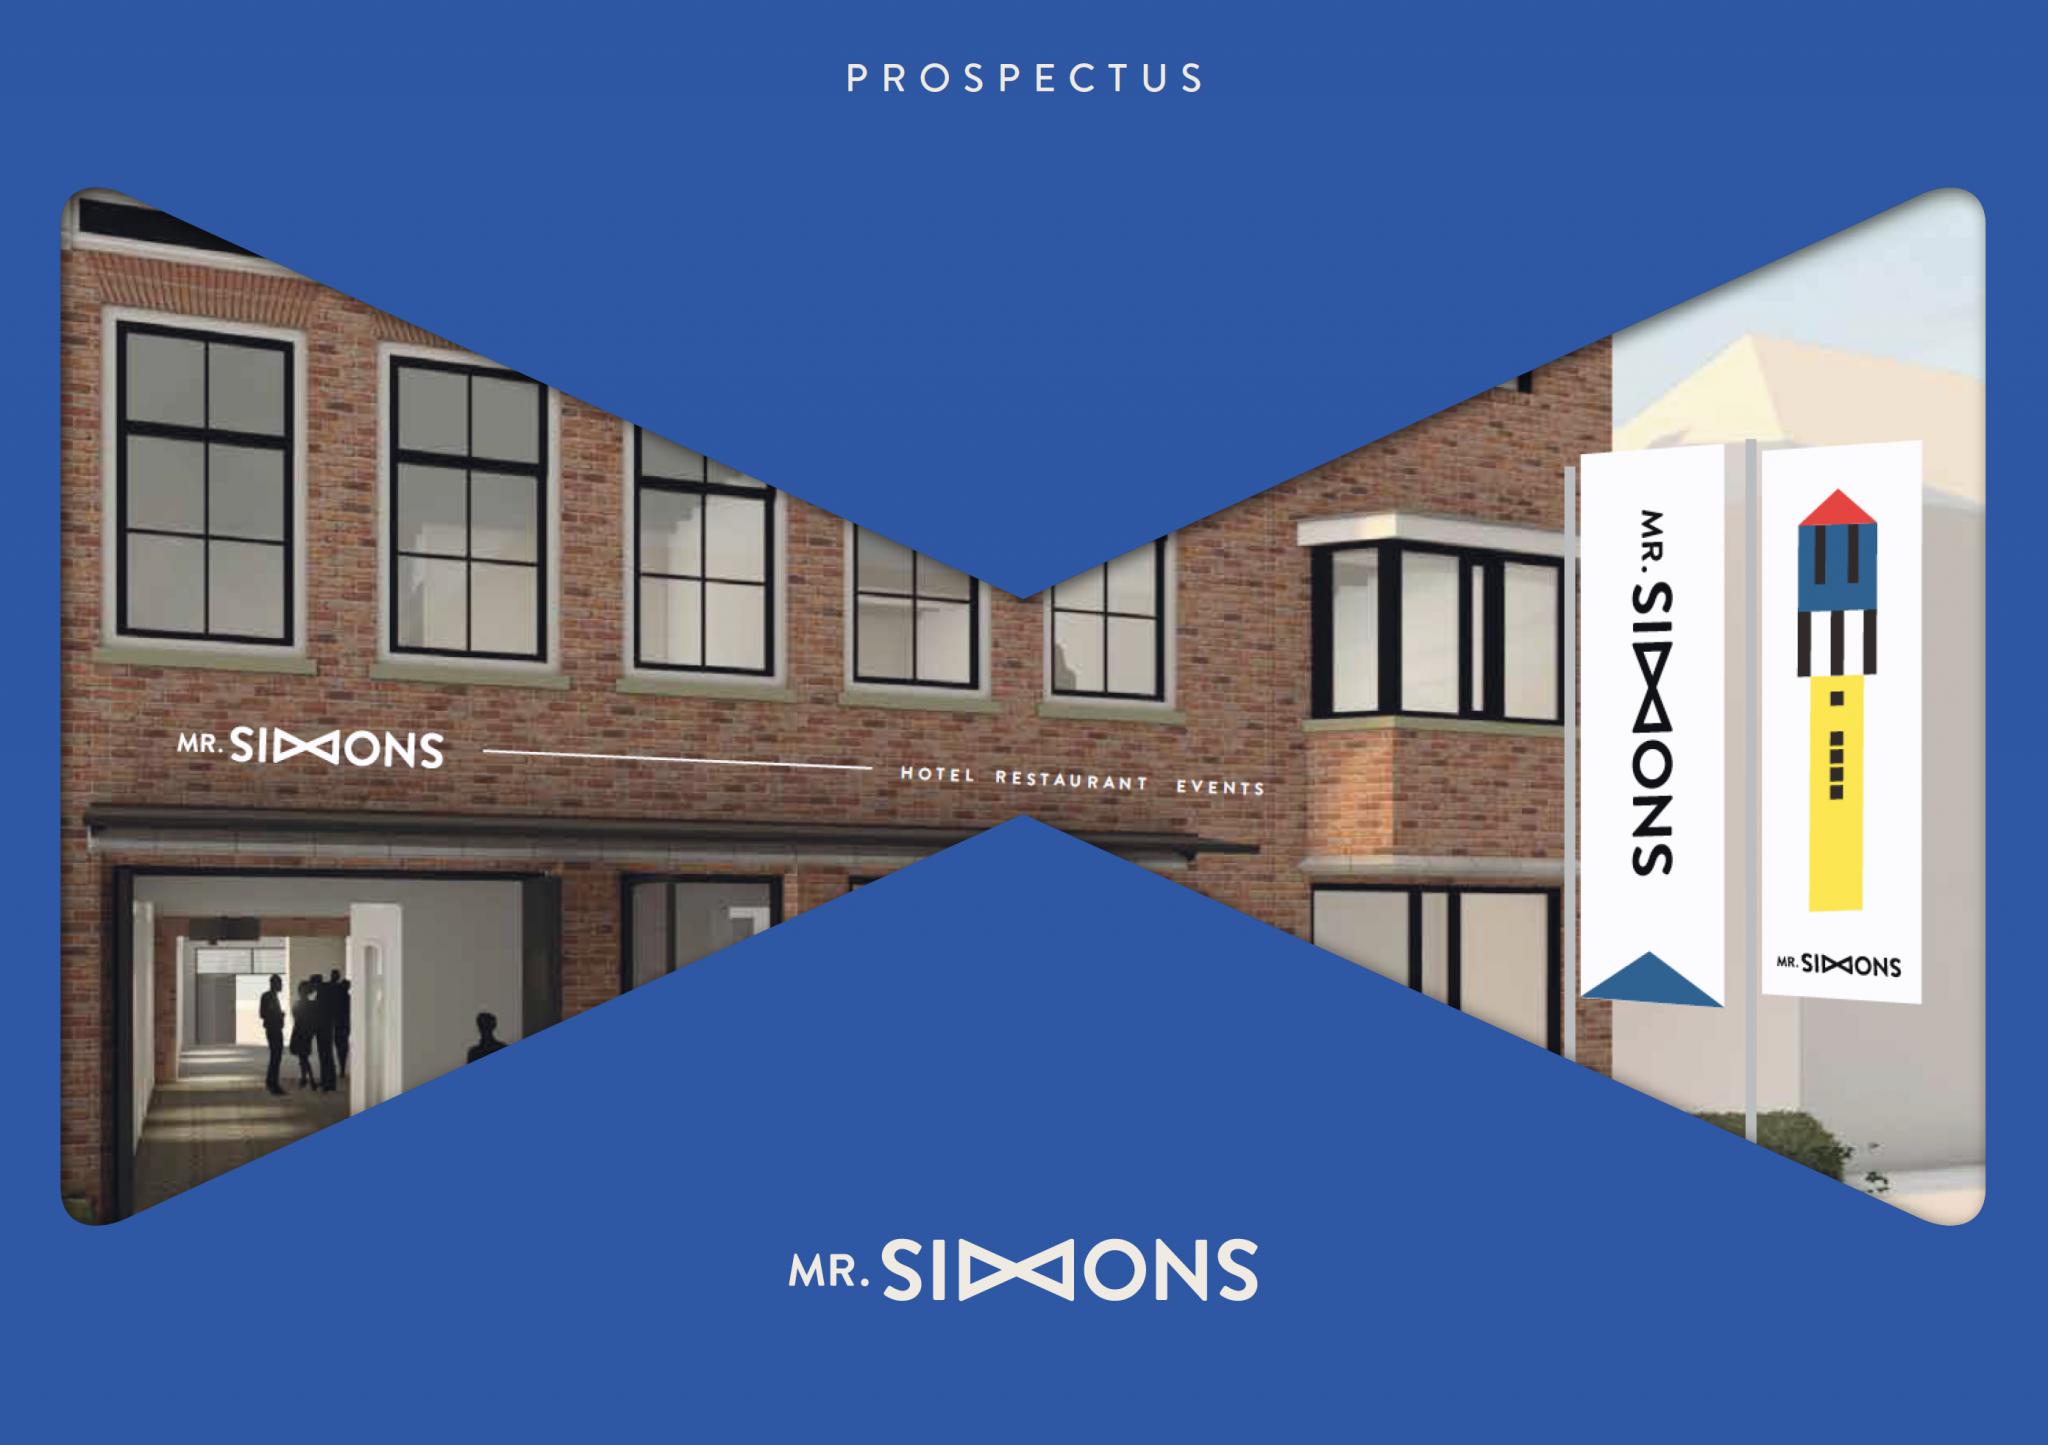 prospectus-mrsimons